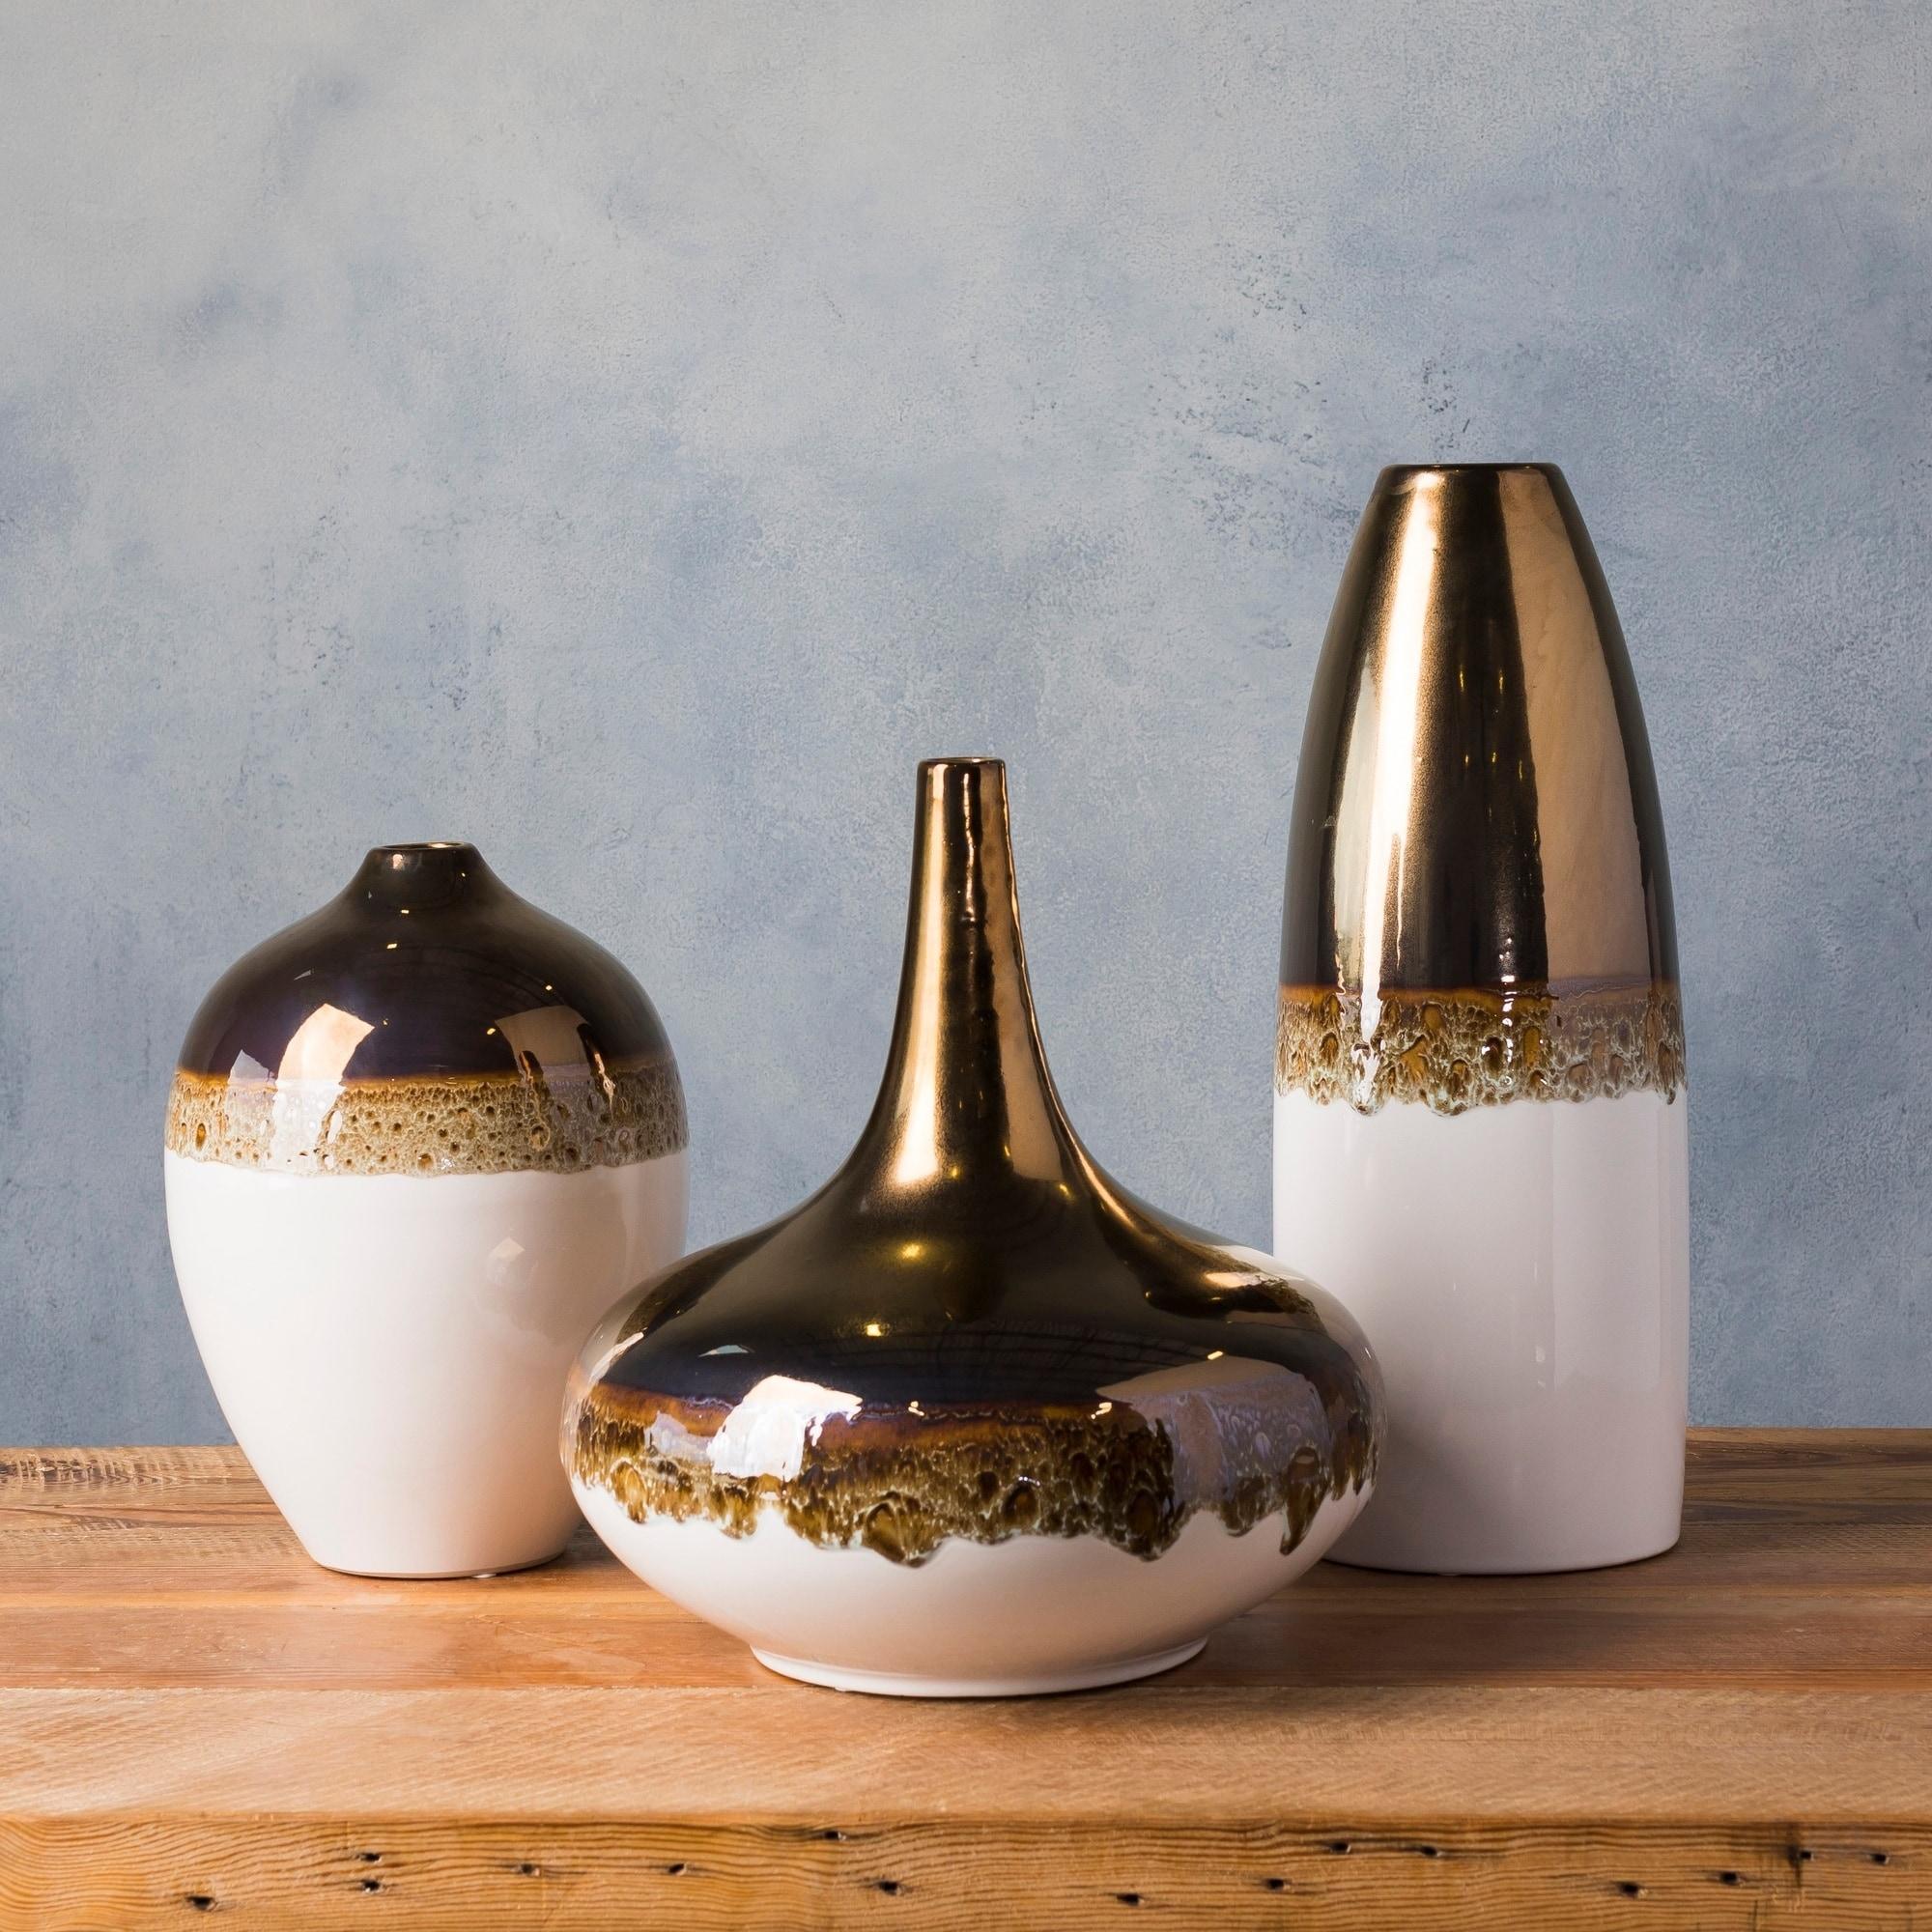 Lucjan gold ceramic modern decorative vase set of 3 free lucjan gold ceramic modern decorative vase set of 3 free shipping today overstock 24367644 reviewsmspy